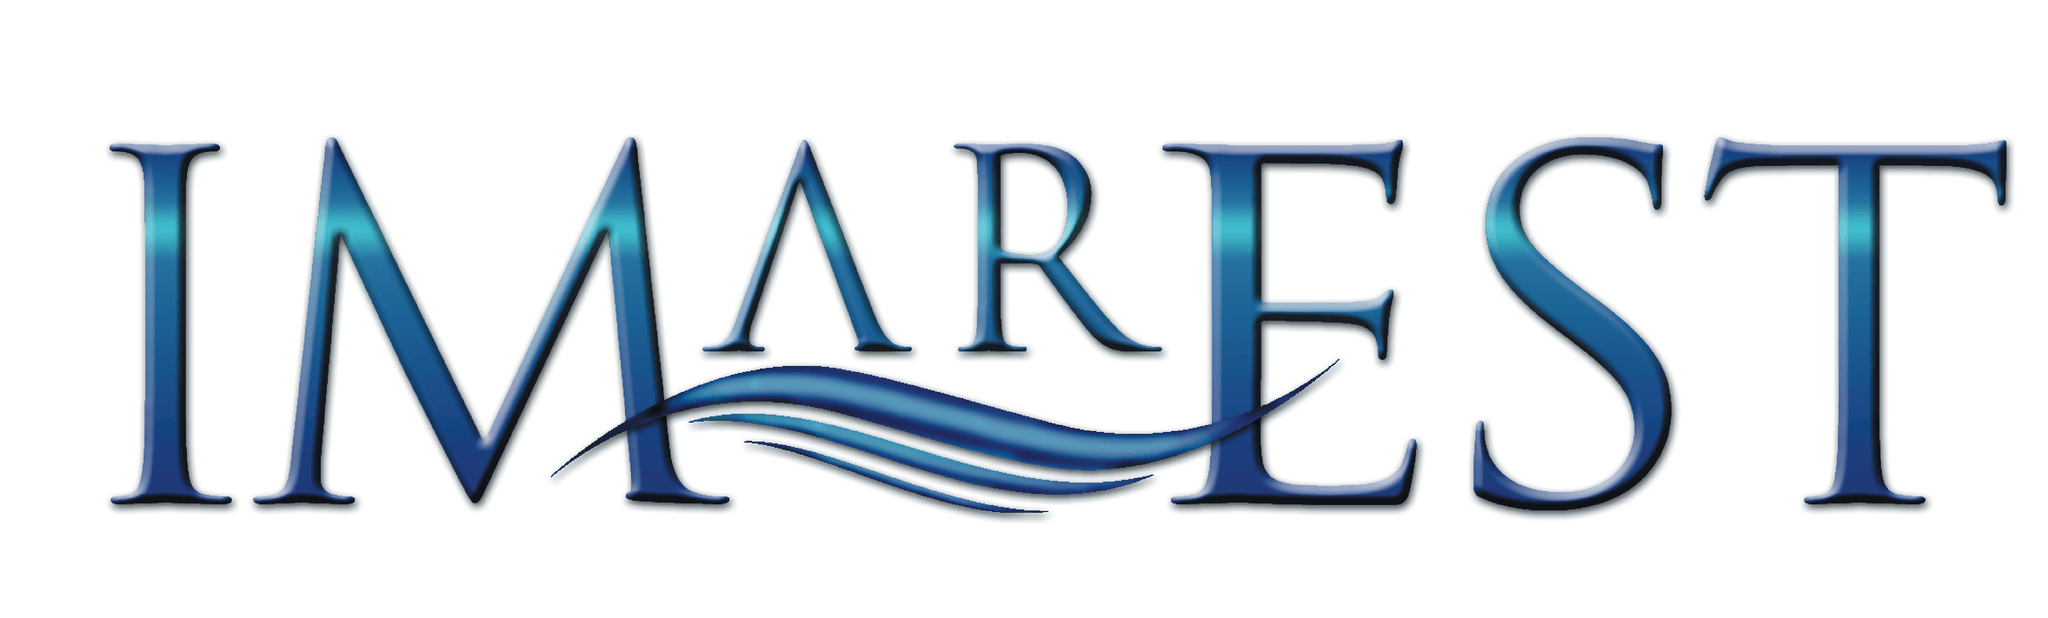 IMAREST logo